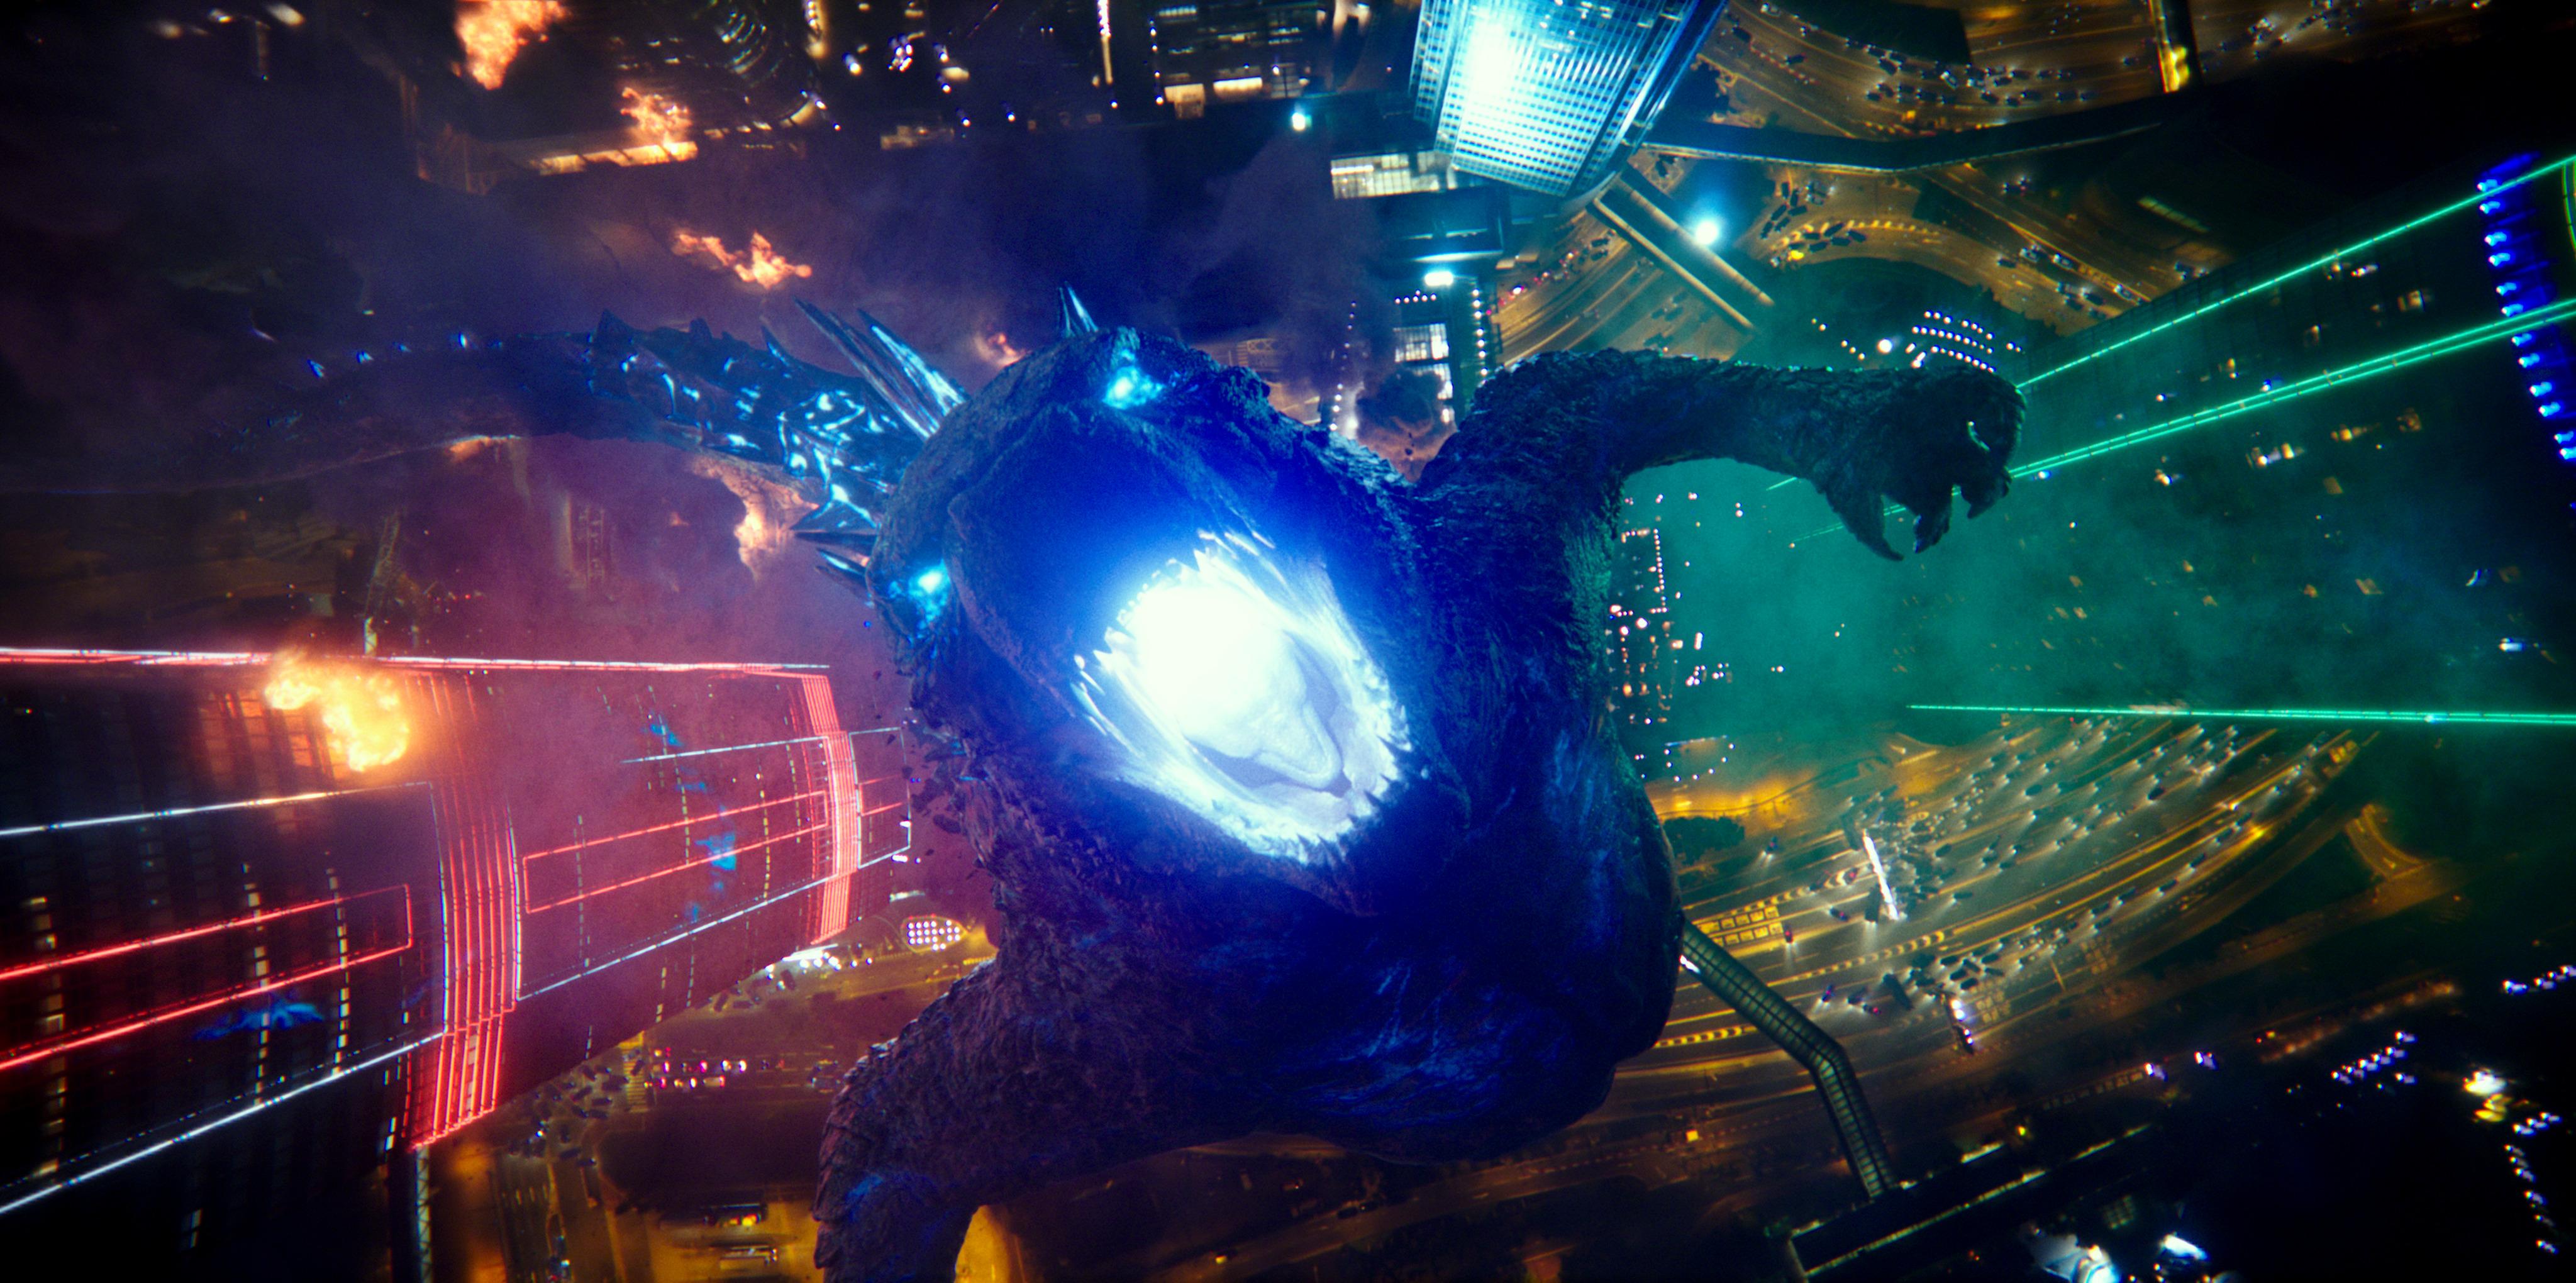 Godzilla roars with his atomic breath